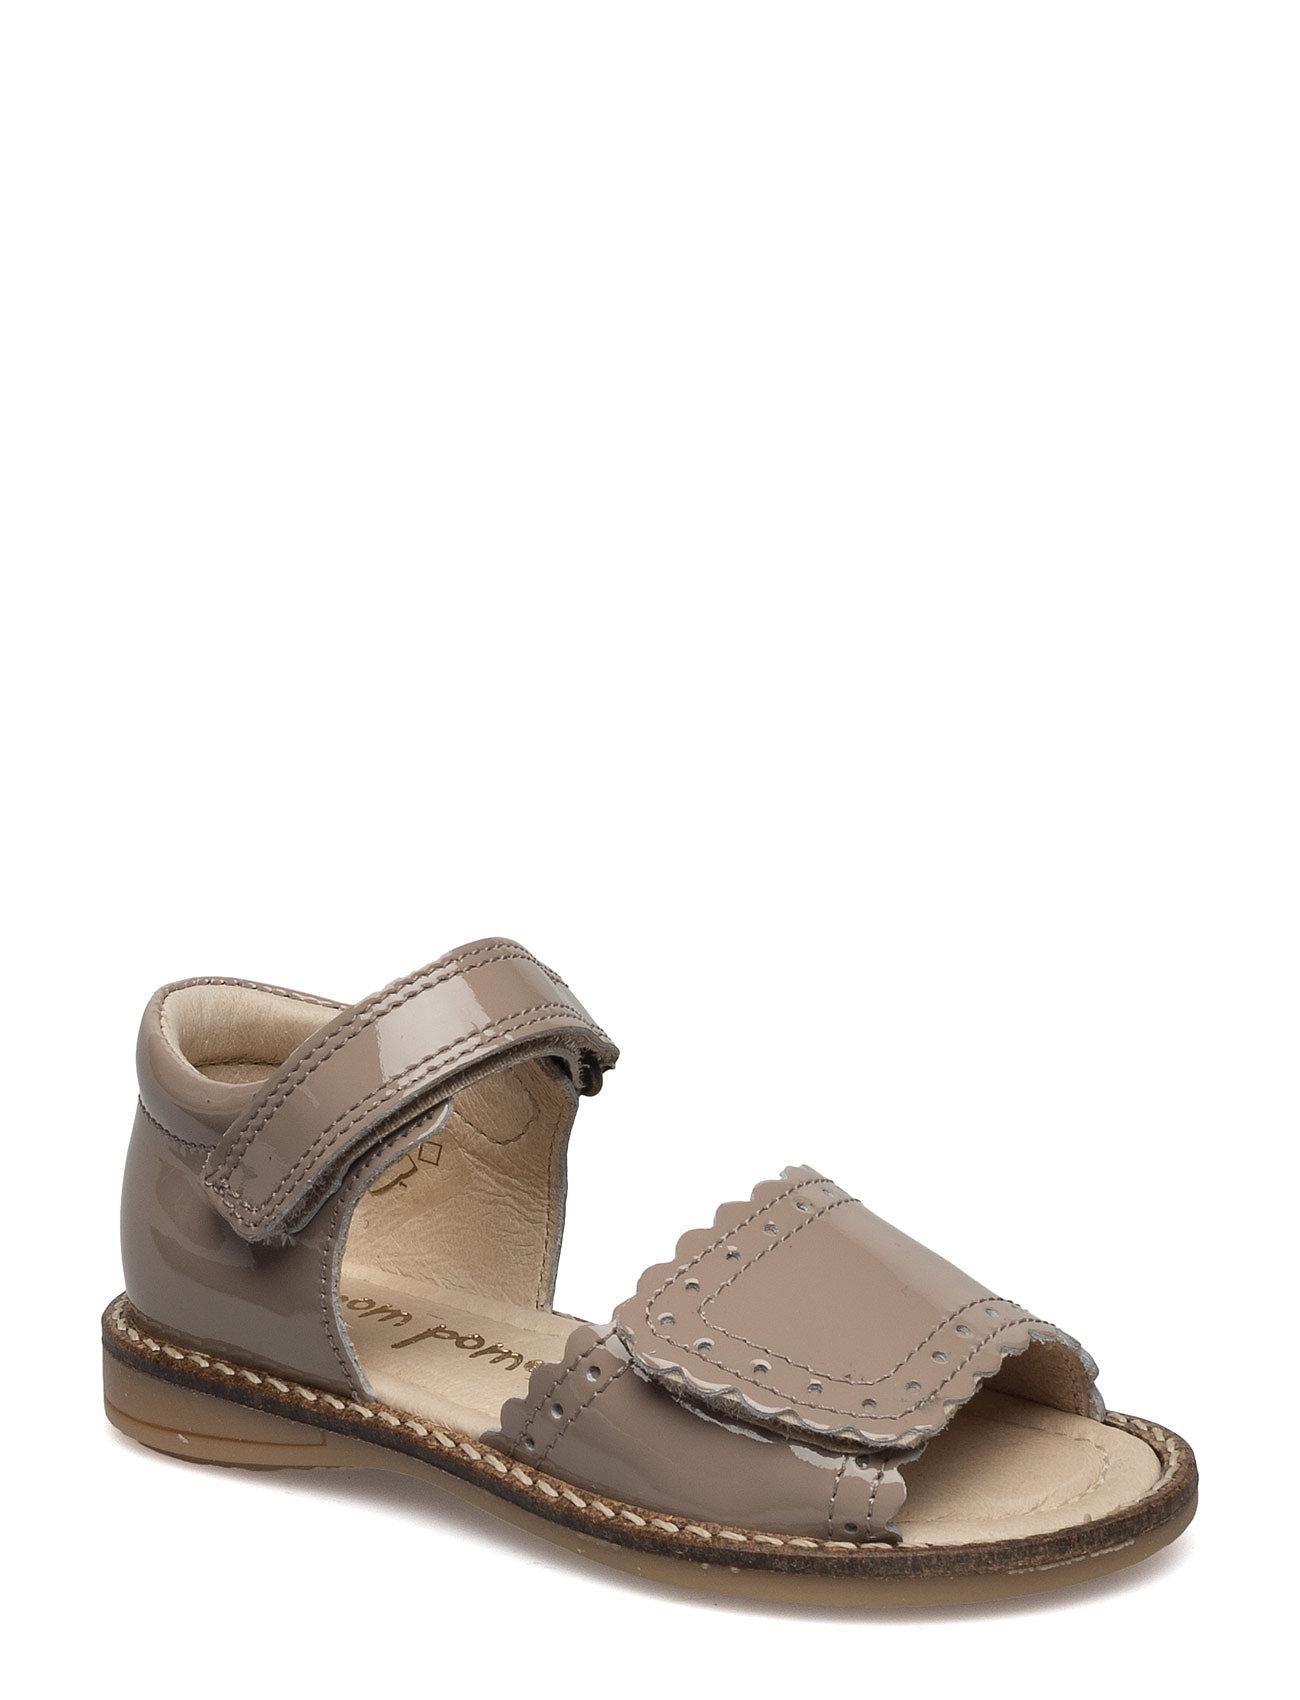 Open Toe Sandal Pom pom Sandaler til Børn i